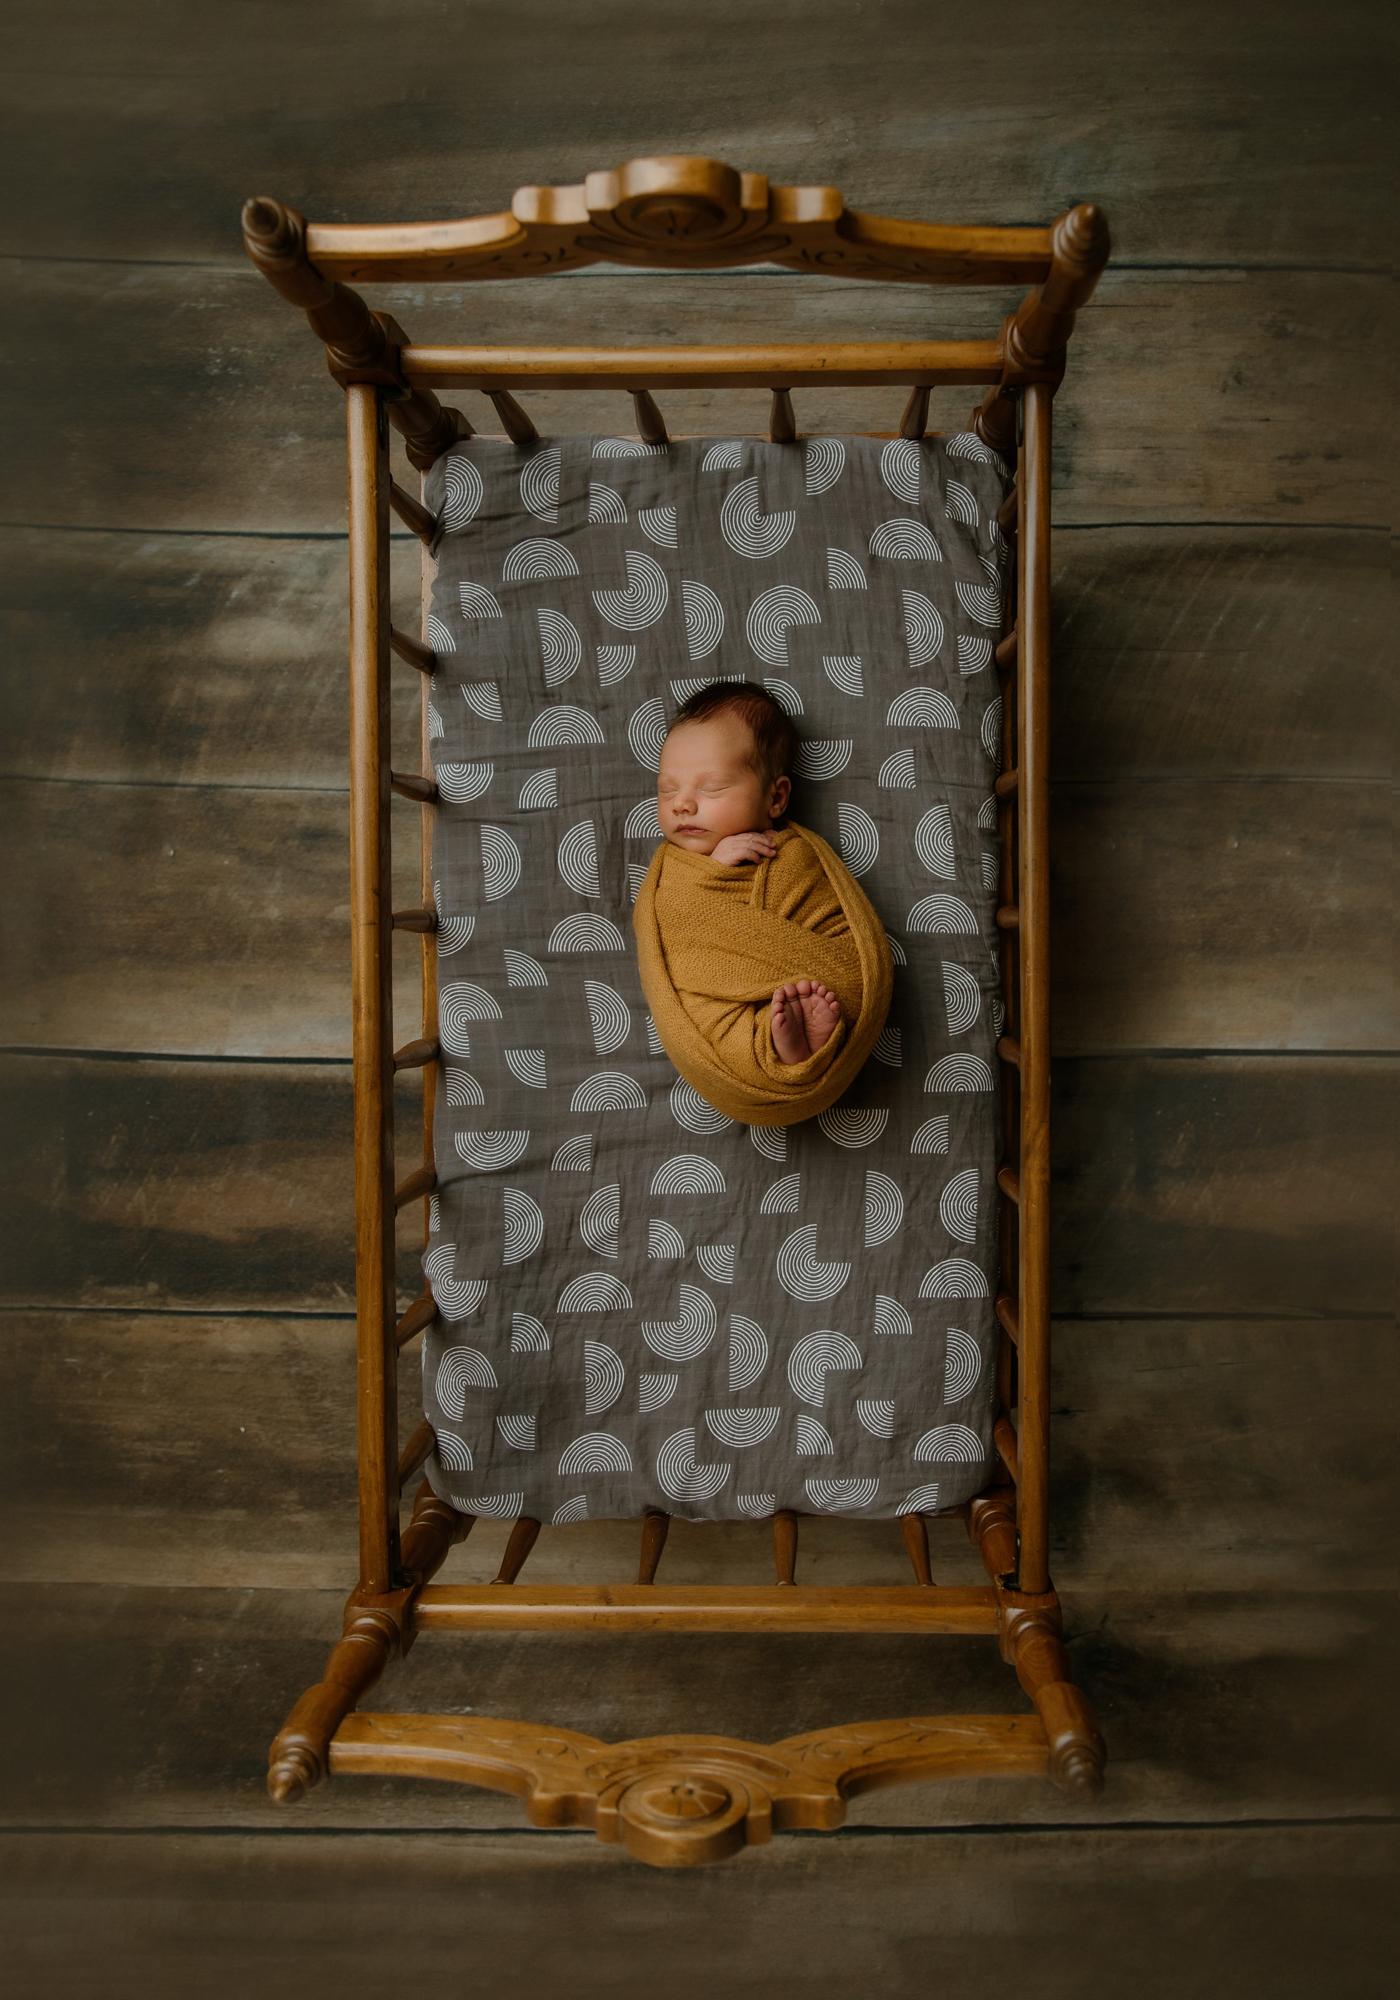 Newborn portrait of baby in yellow knit wrap in antique crib